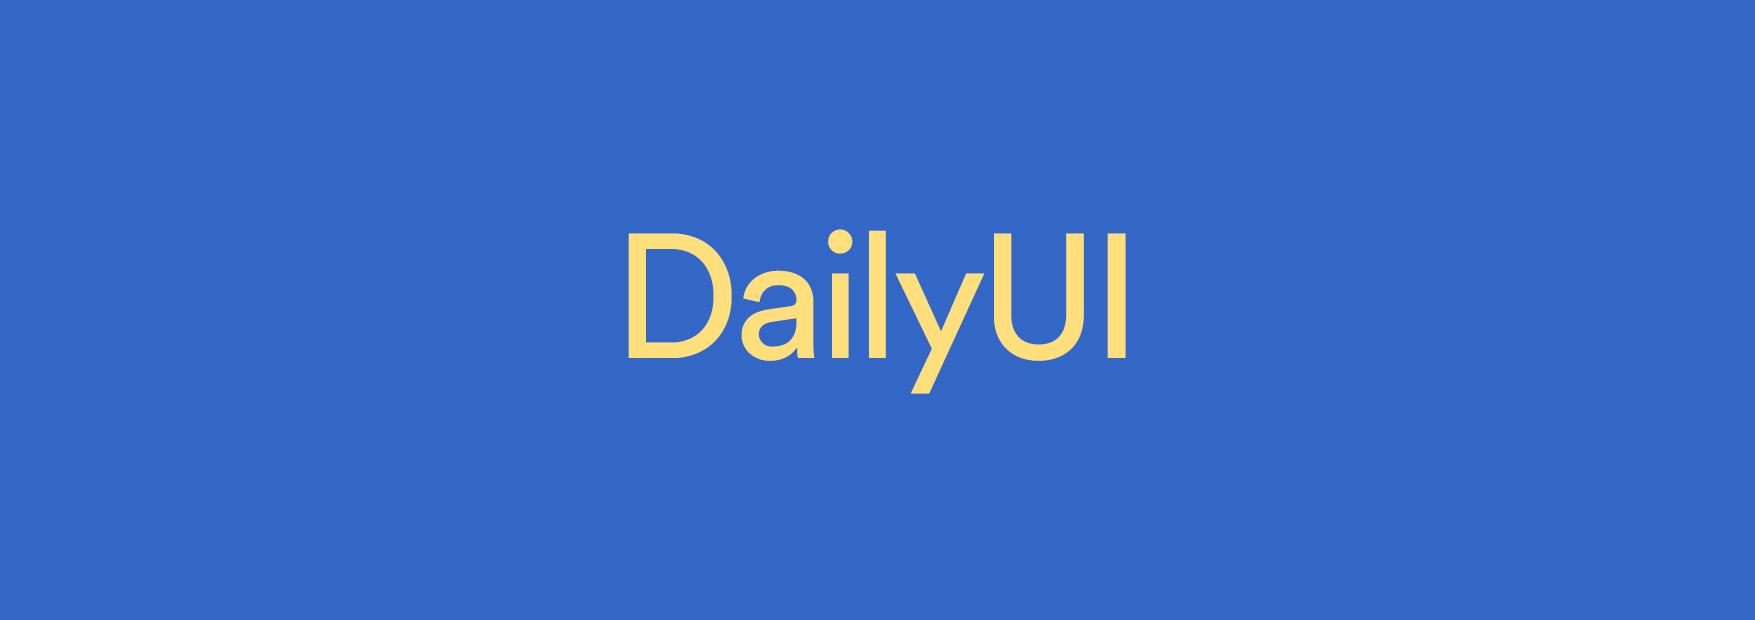 dailyui_cover